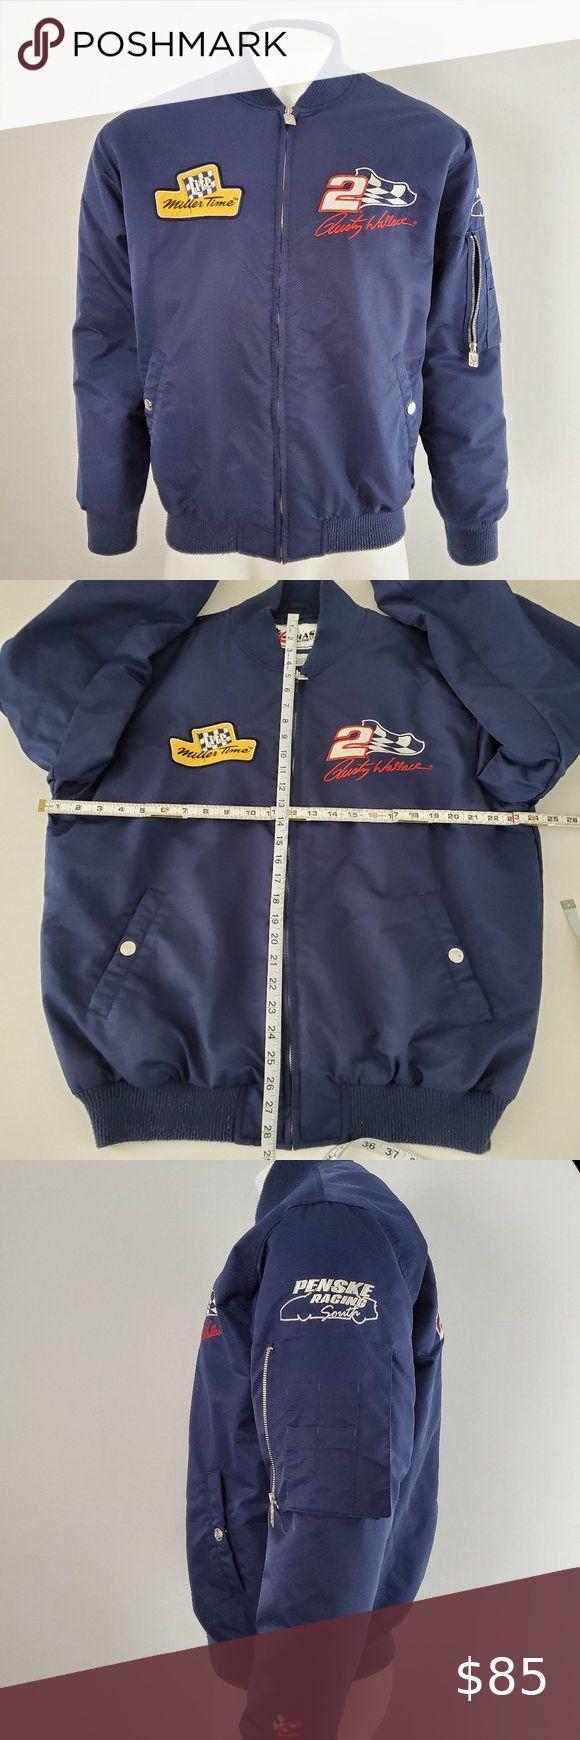 Vintage Rusty Wallace Nascar Jacket Size M in 2020